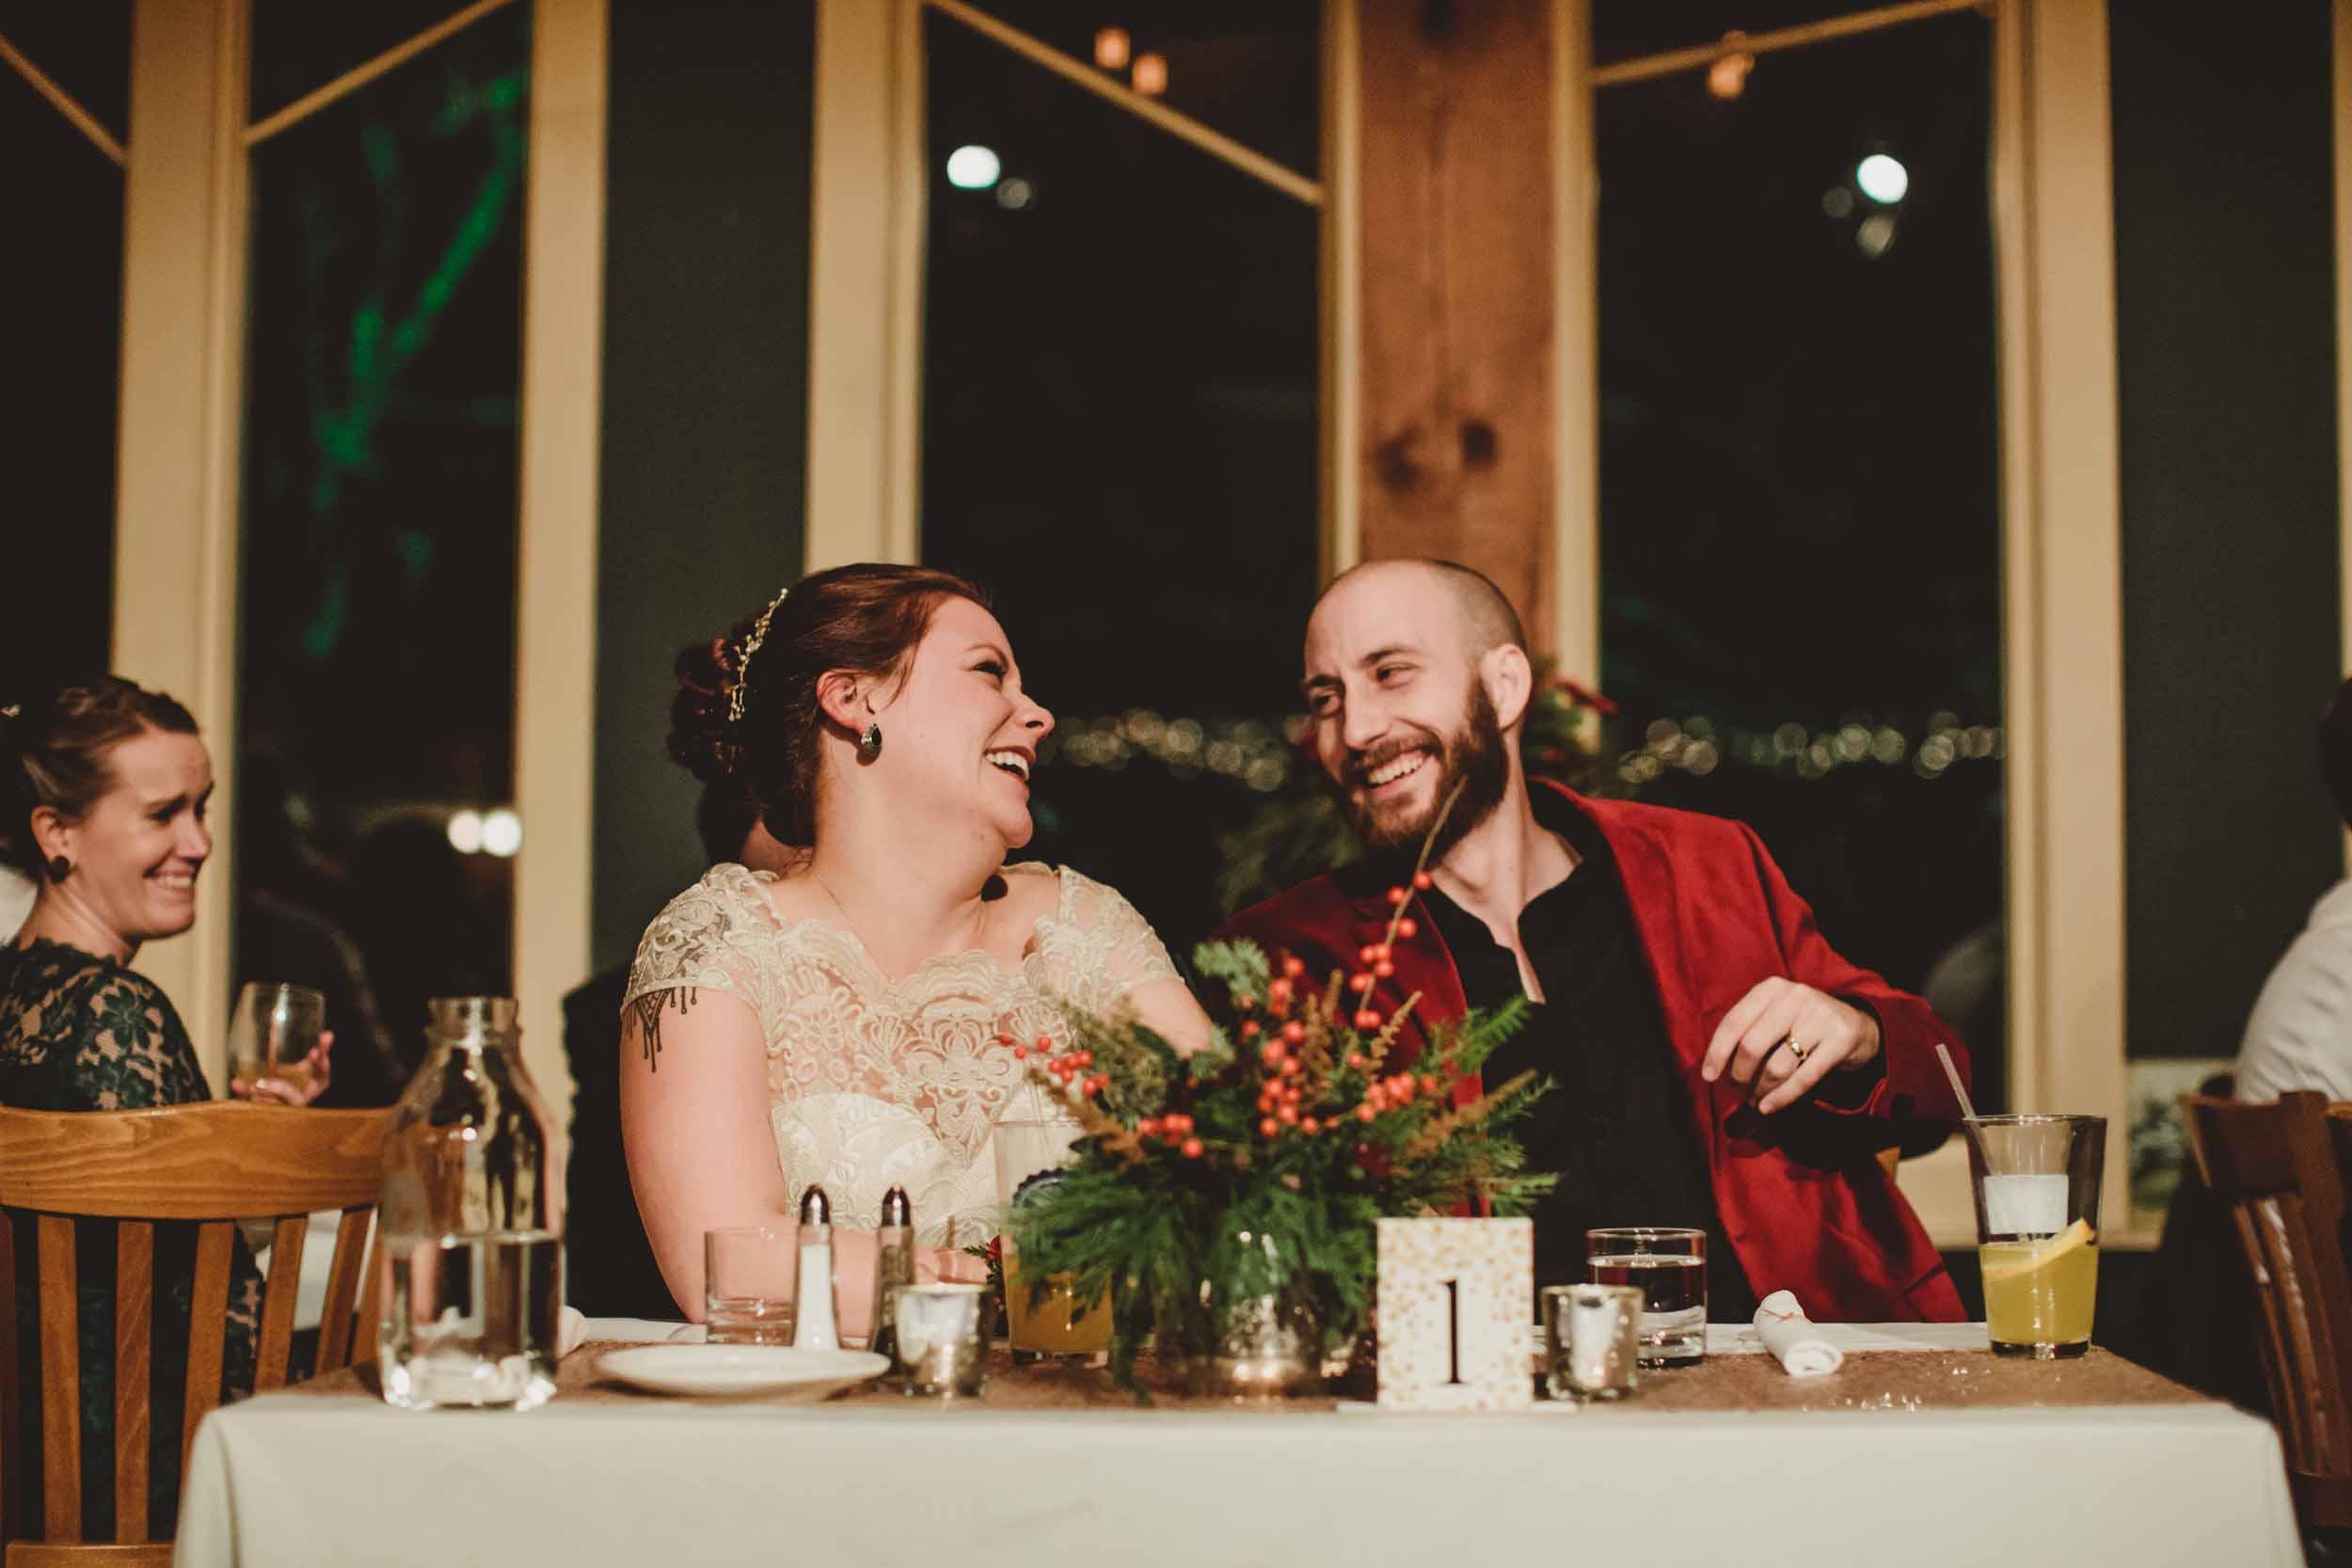 Stone-mountain-arts-wedding76.jpg